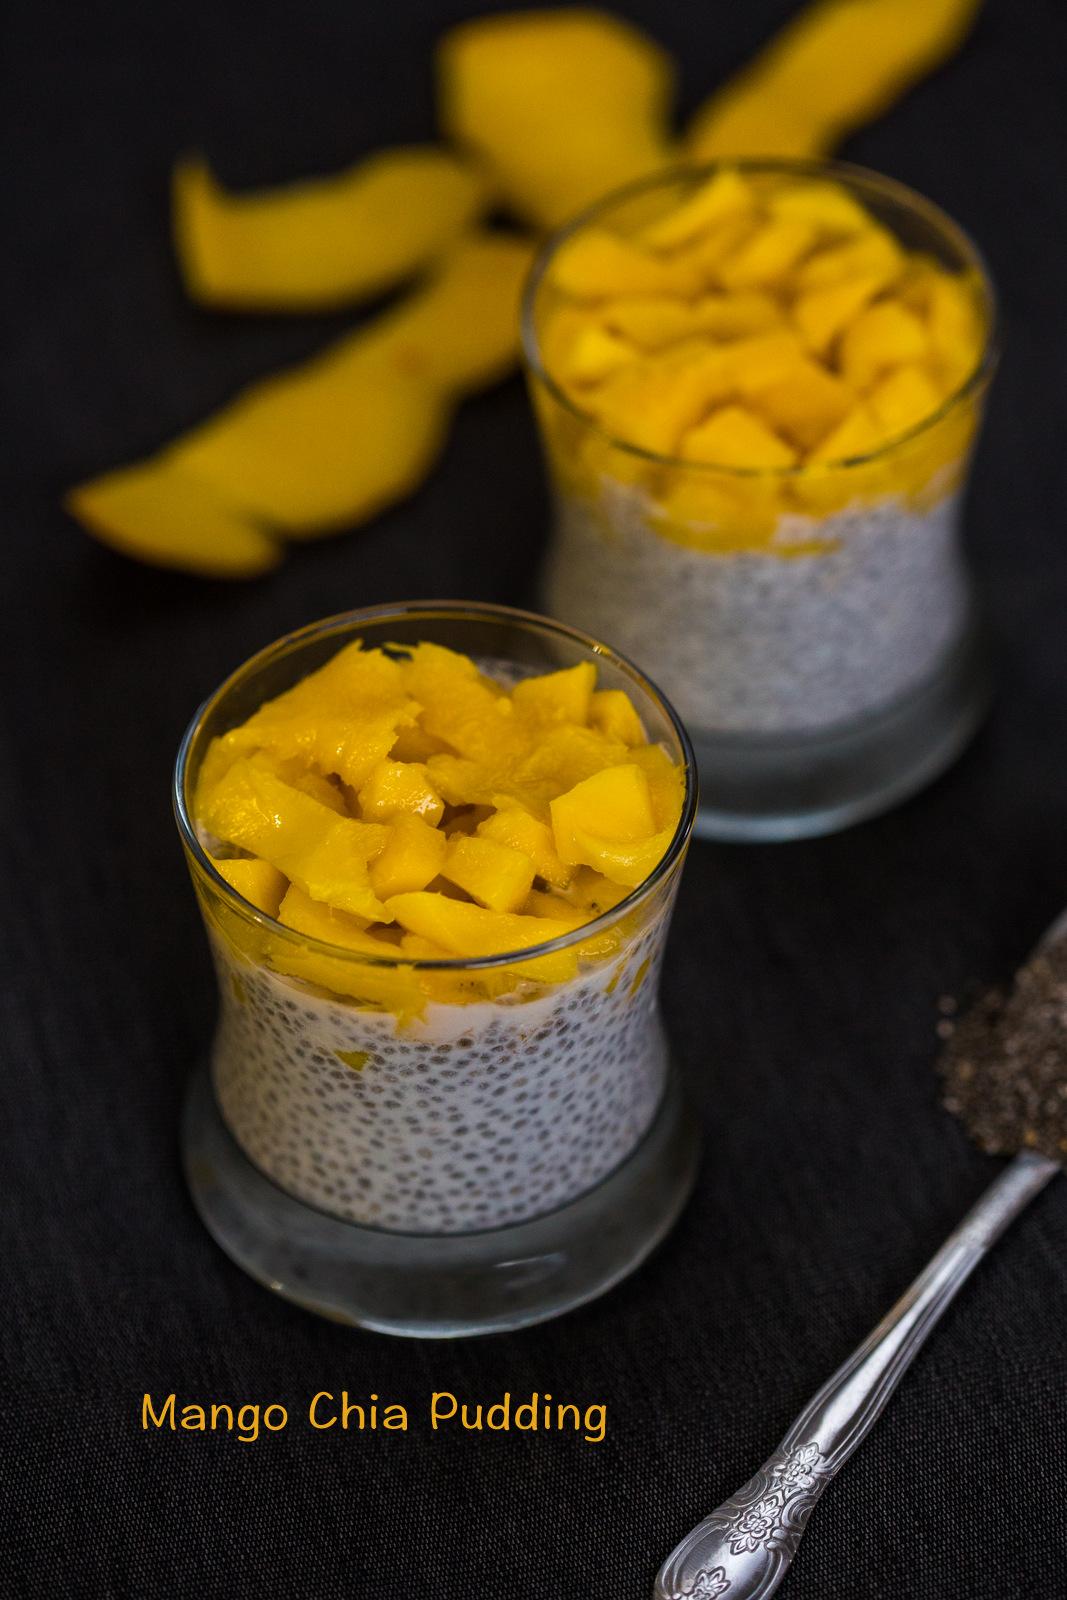 chia seeds, paleo diet, recipes, mango recipes, breakfast recipes, chia seeds recipes, paleo recipes, fruits, healthy recipes